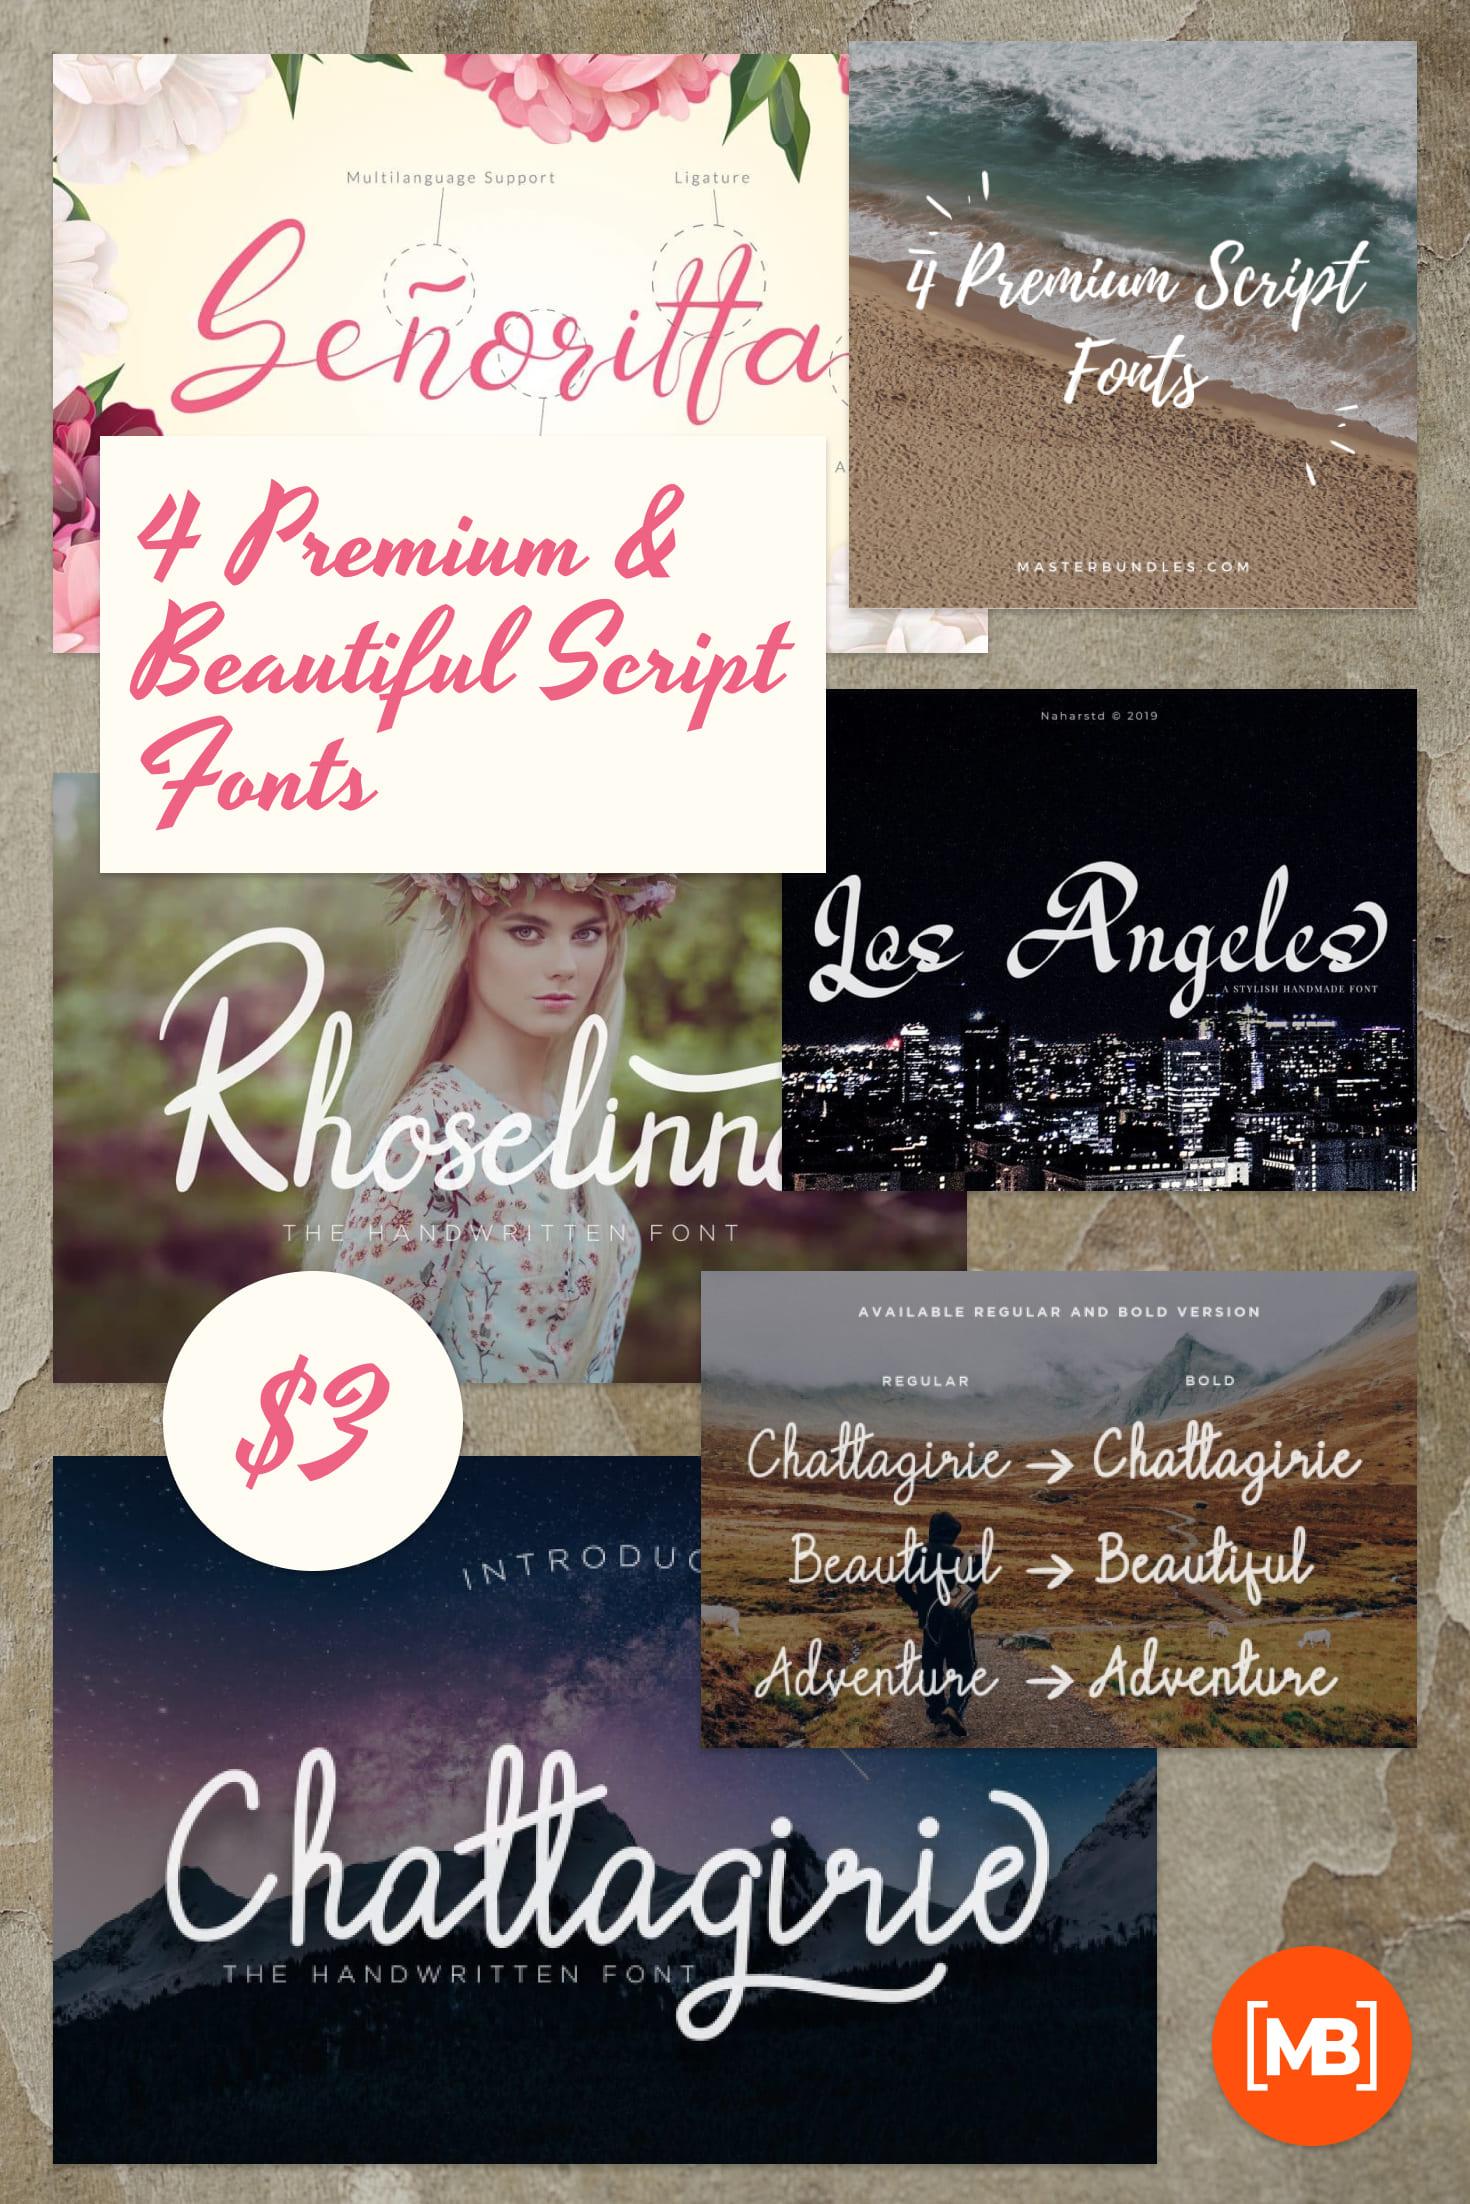 Pinterest Image: 4 Premium & Beautiful Script Fonts - 3$.